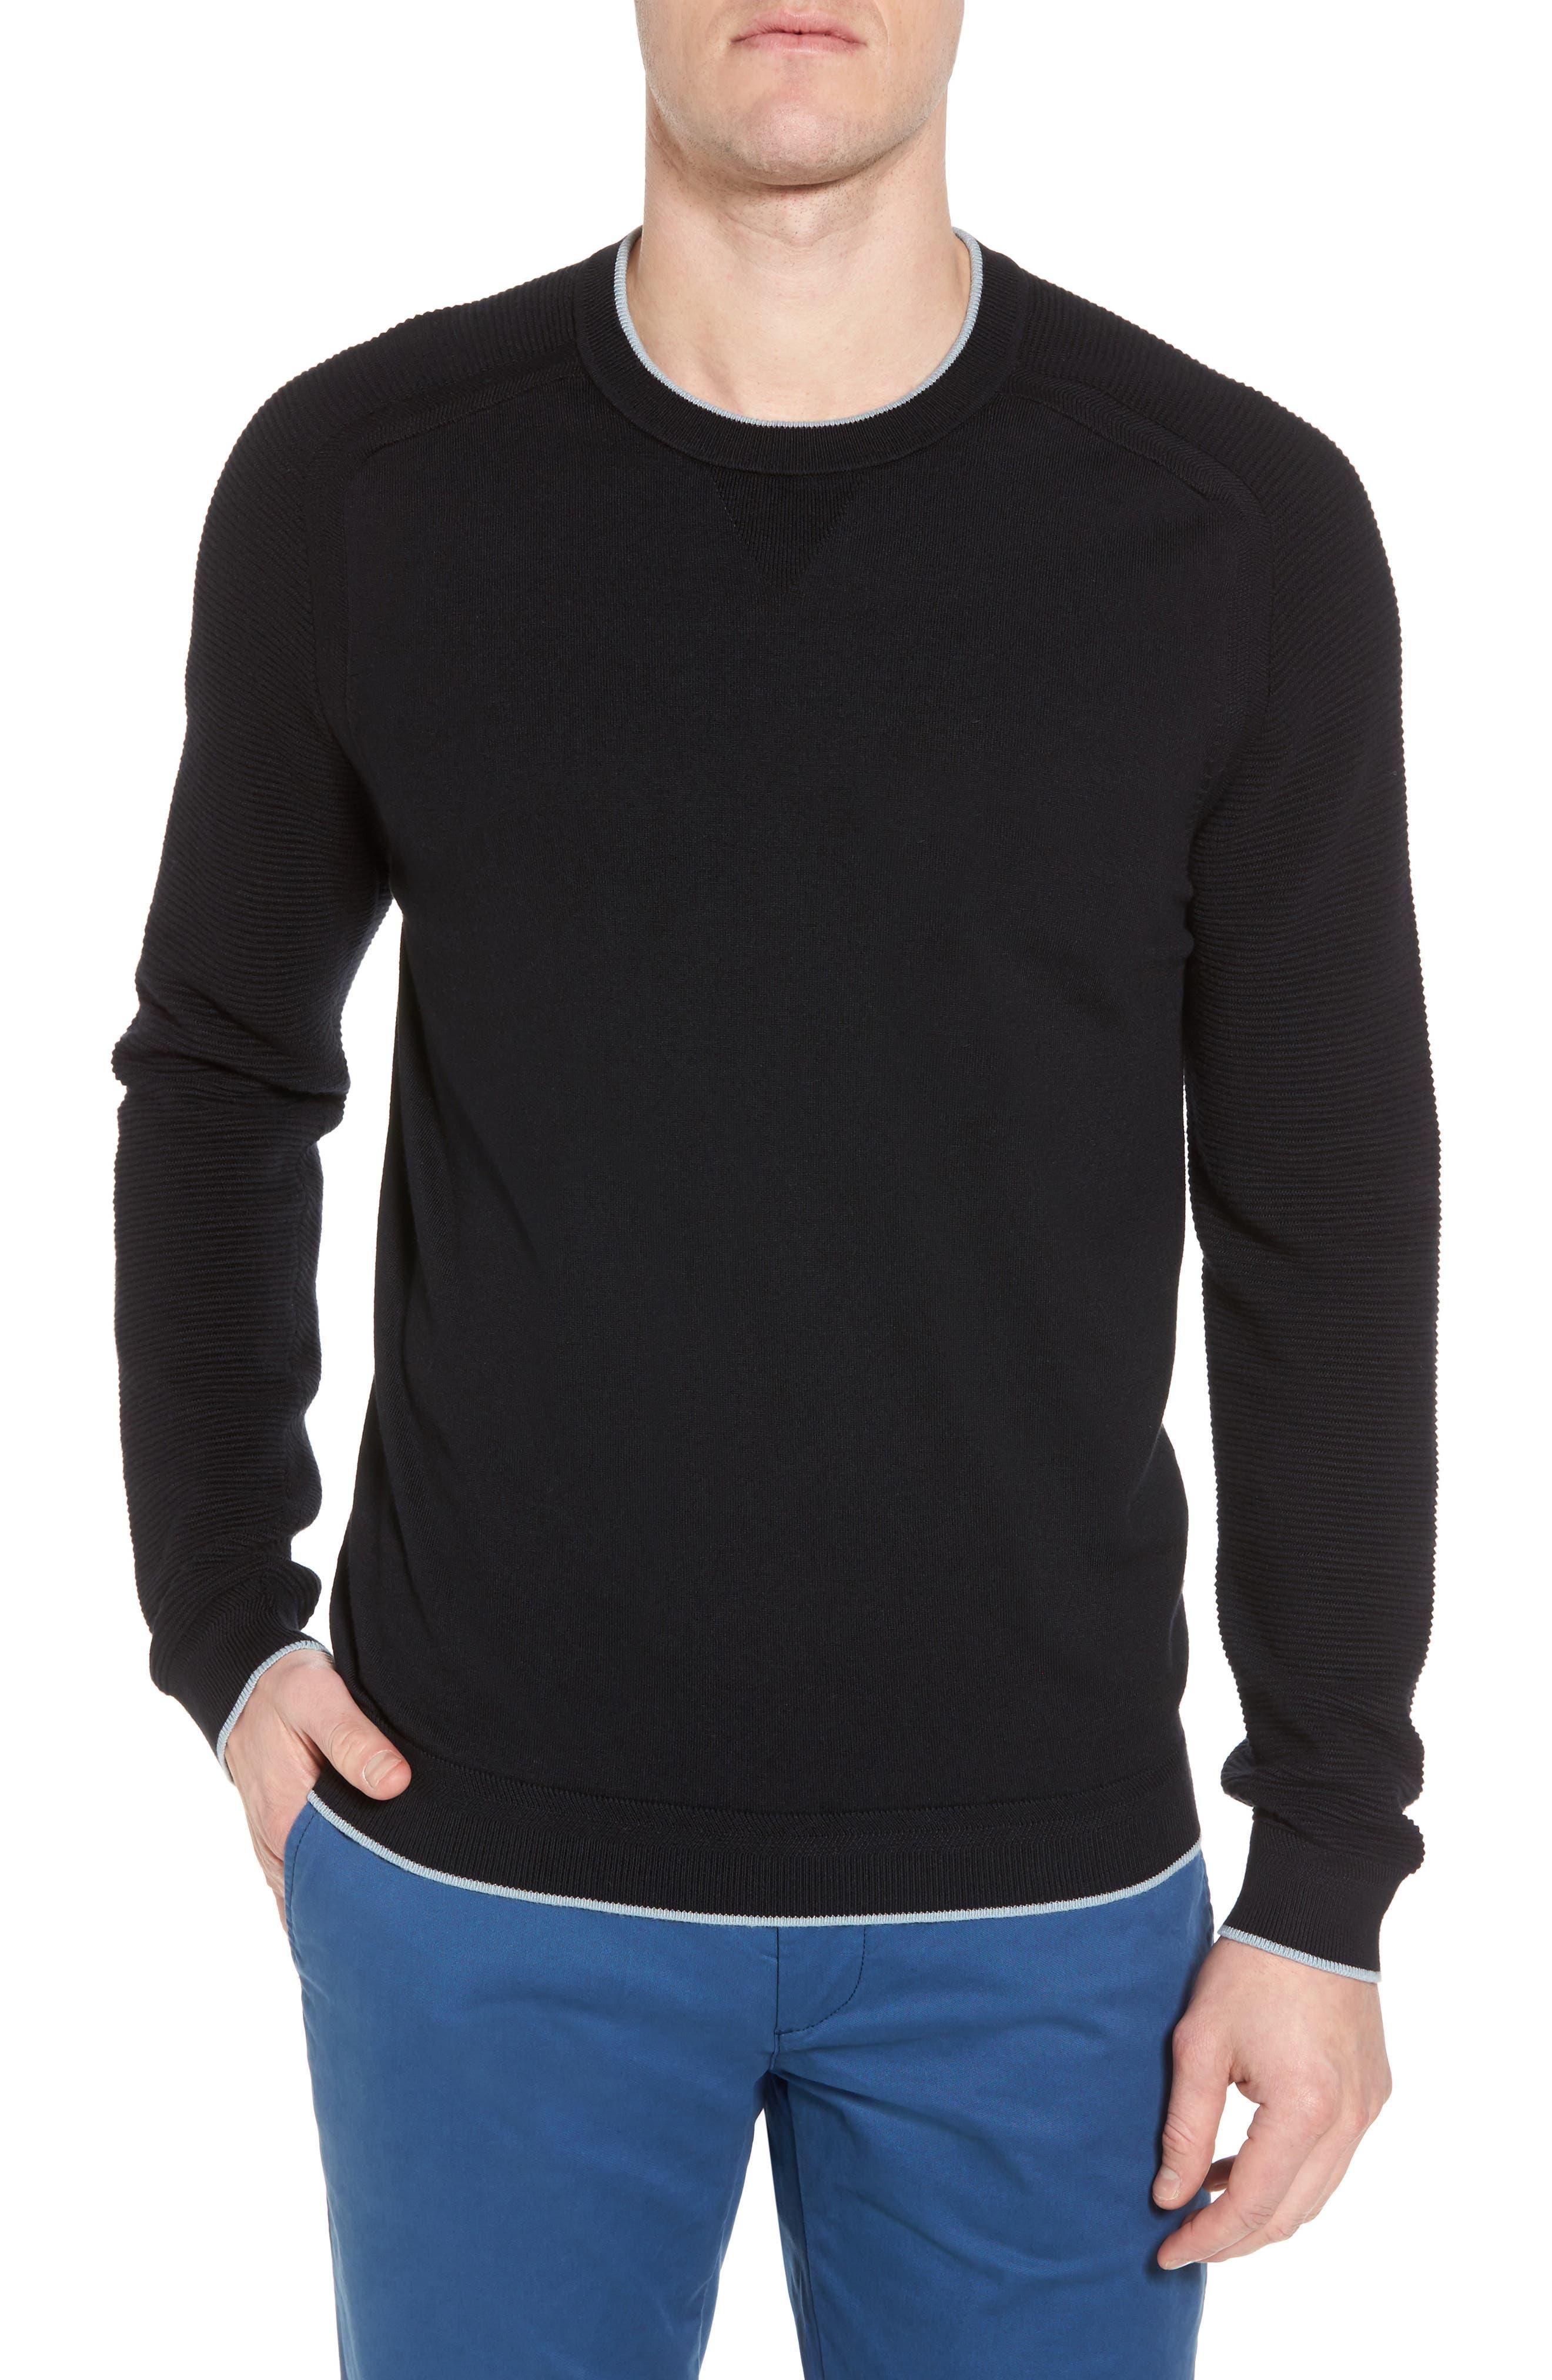 Kayfed Rib Sleeve Sweater,                         Main,                         color, 001